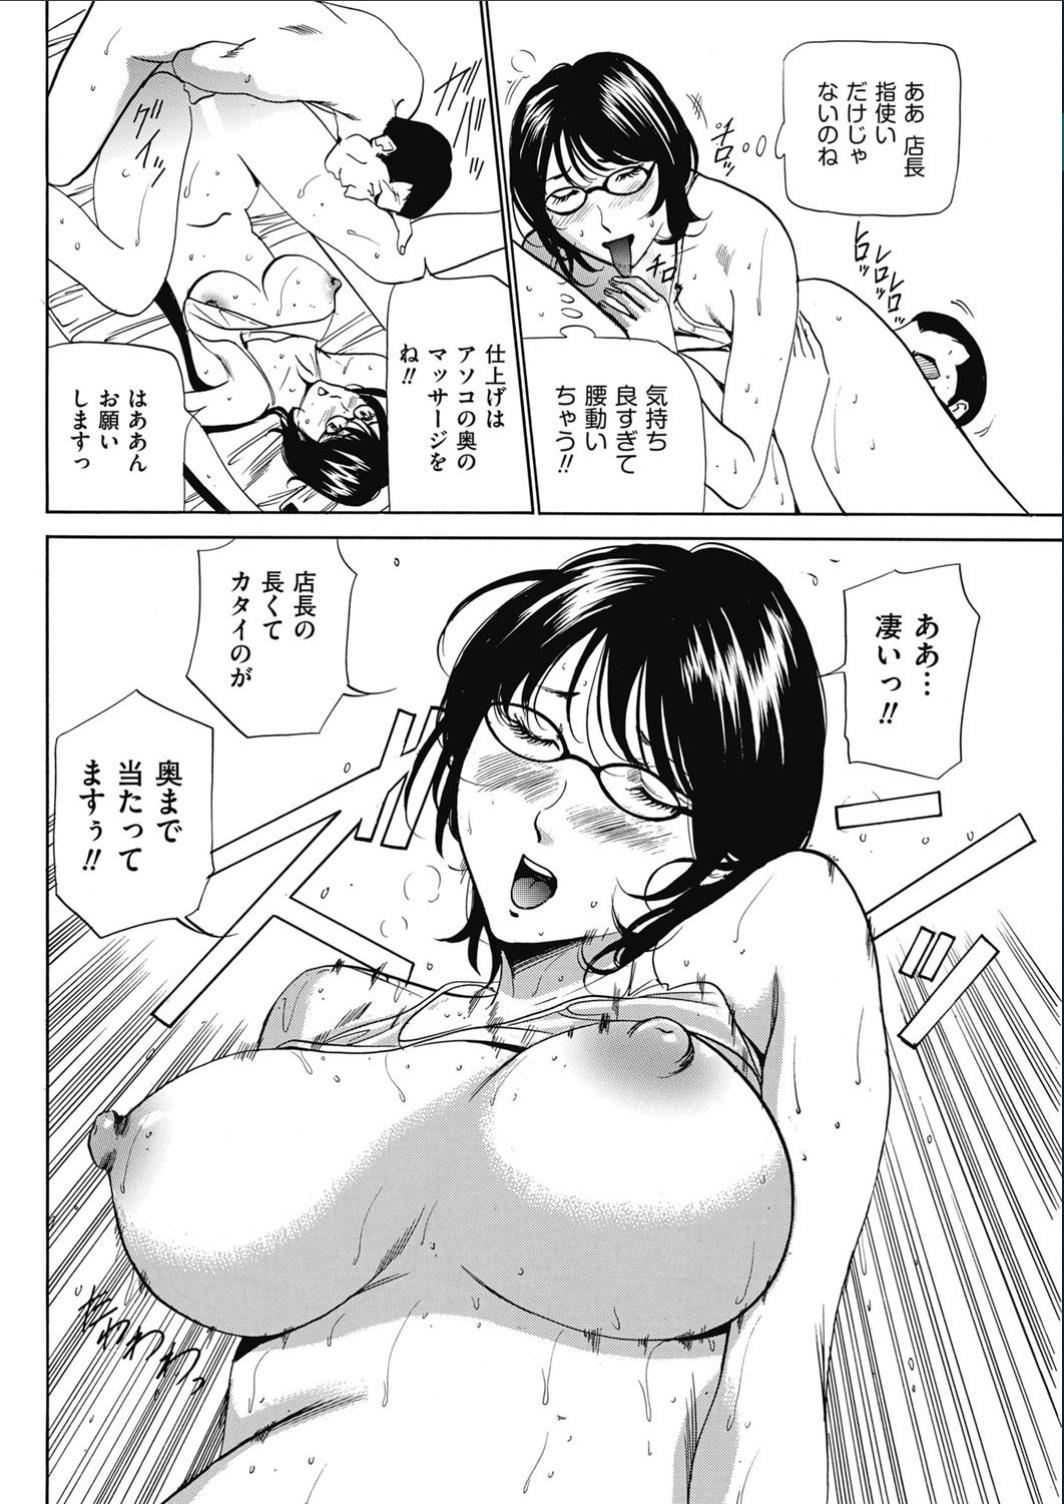 Wa Usuki Ipa a 1-10 106